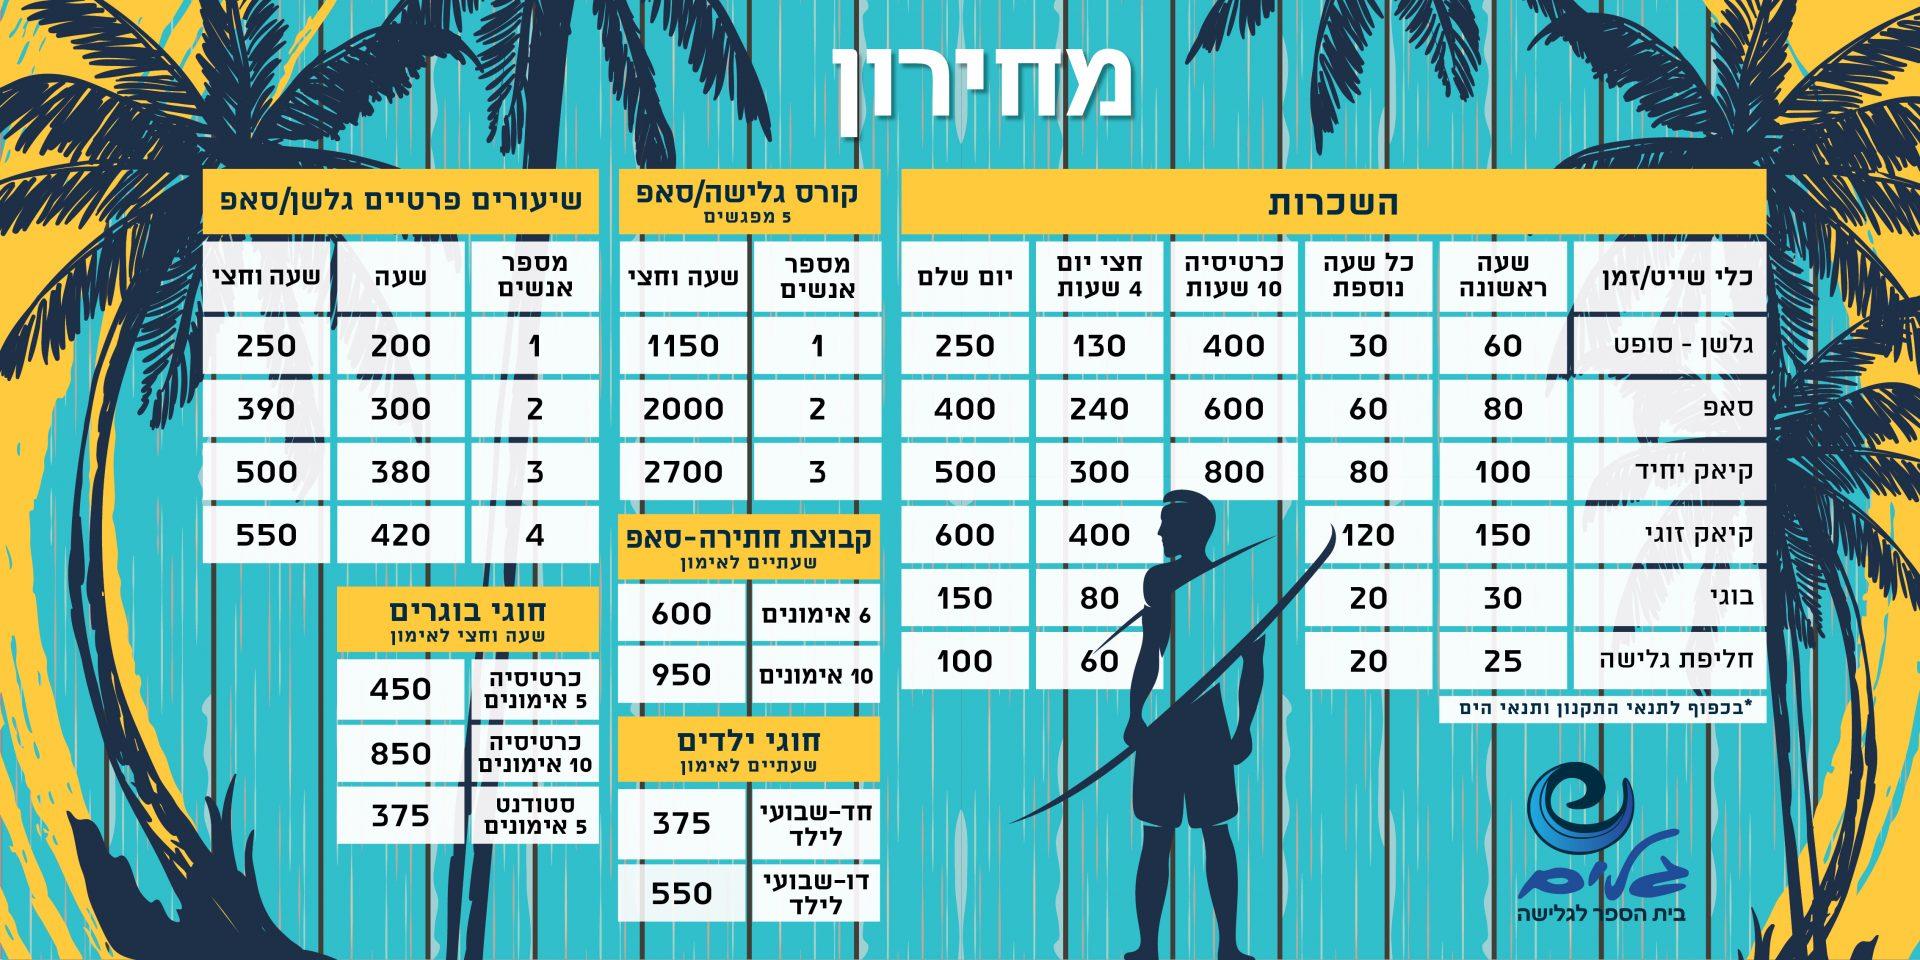 Galim surf school - rental price list